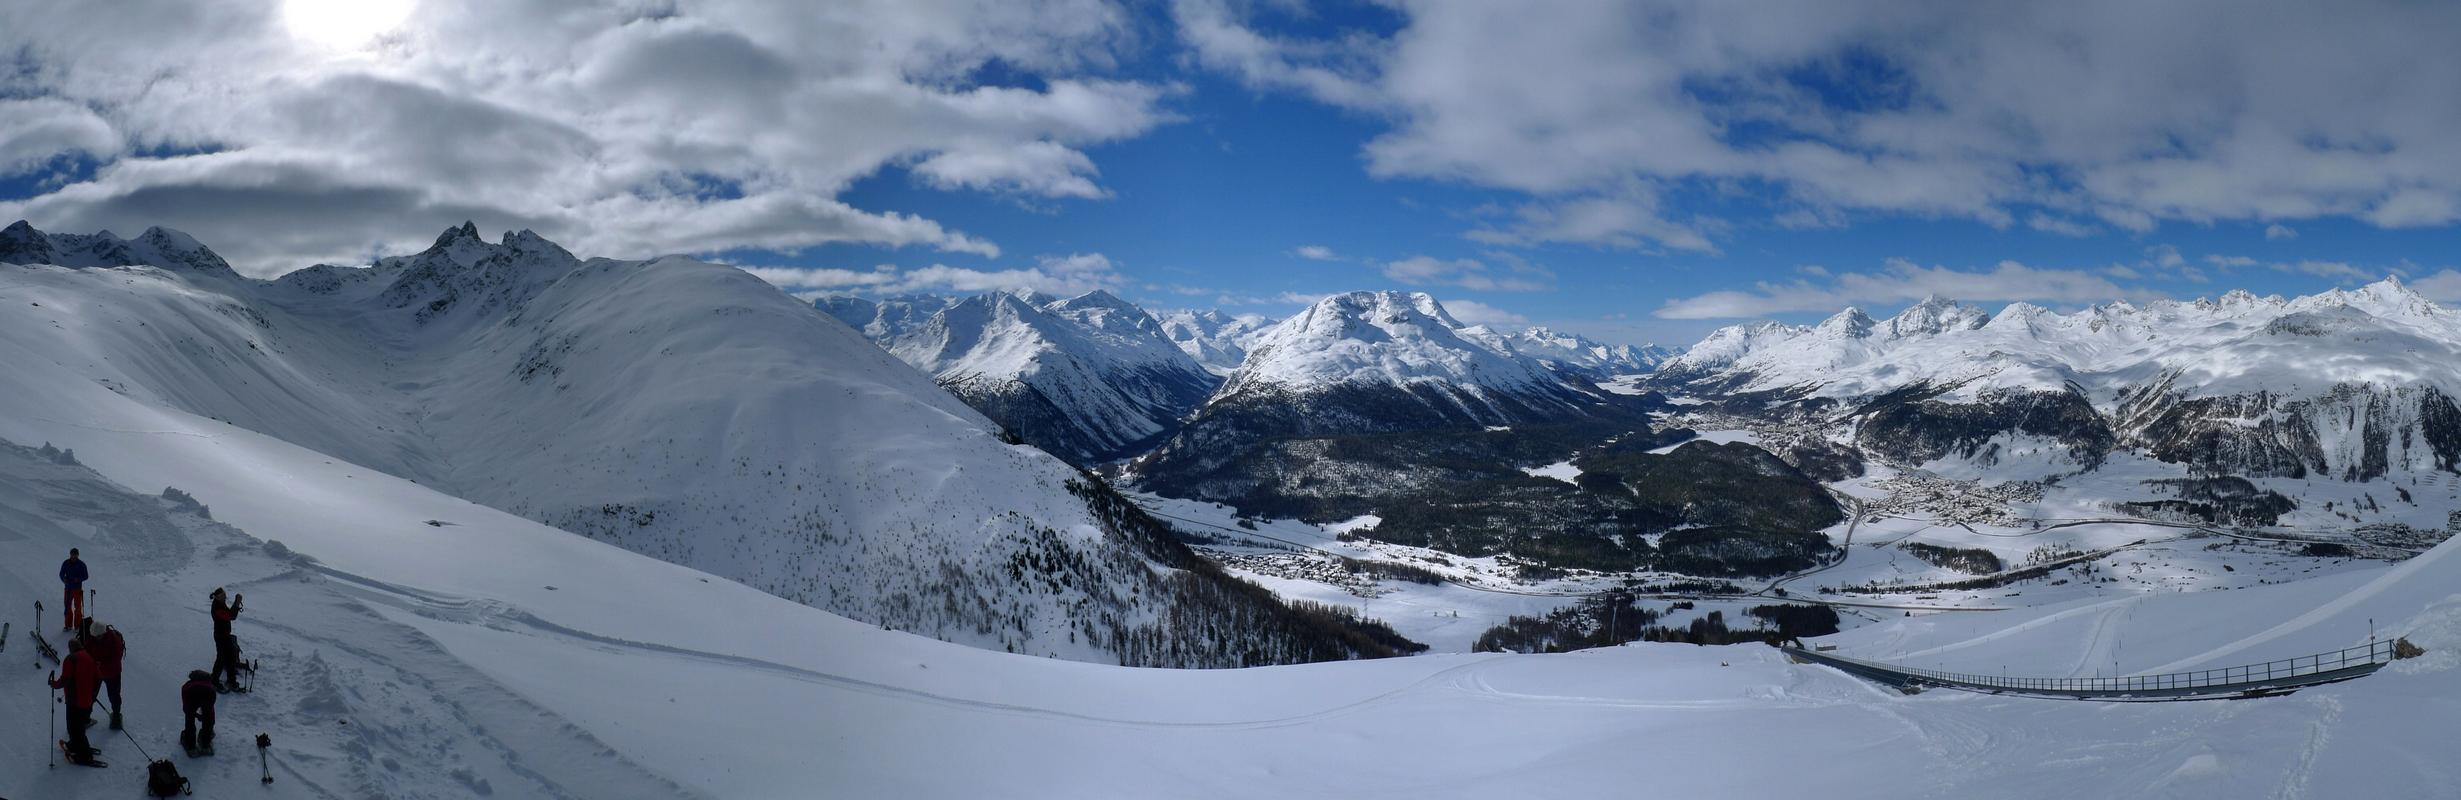 Piz Muragl Albula Alpen Švýcarsko panorama 13